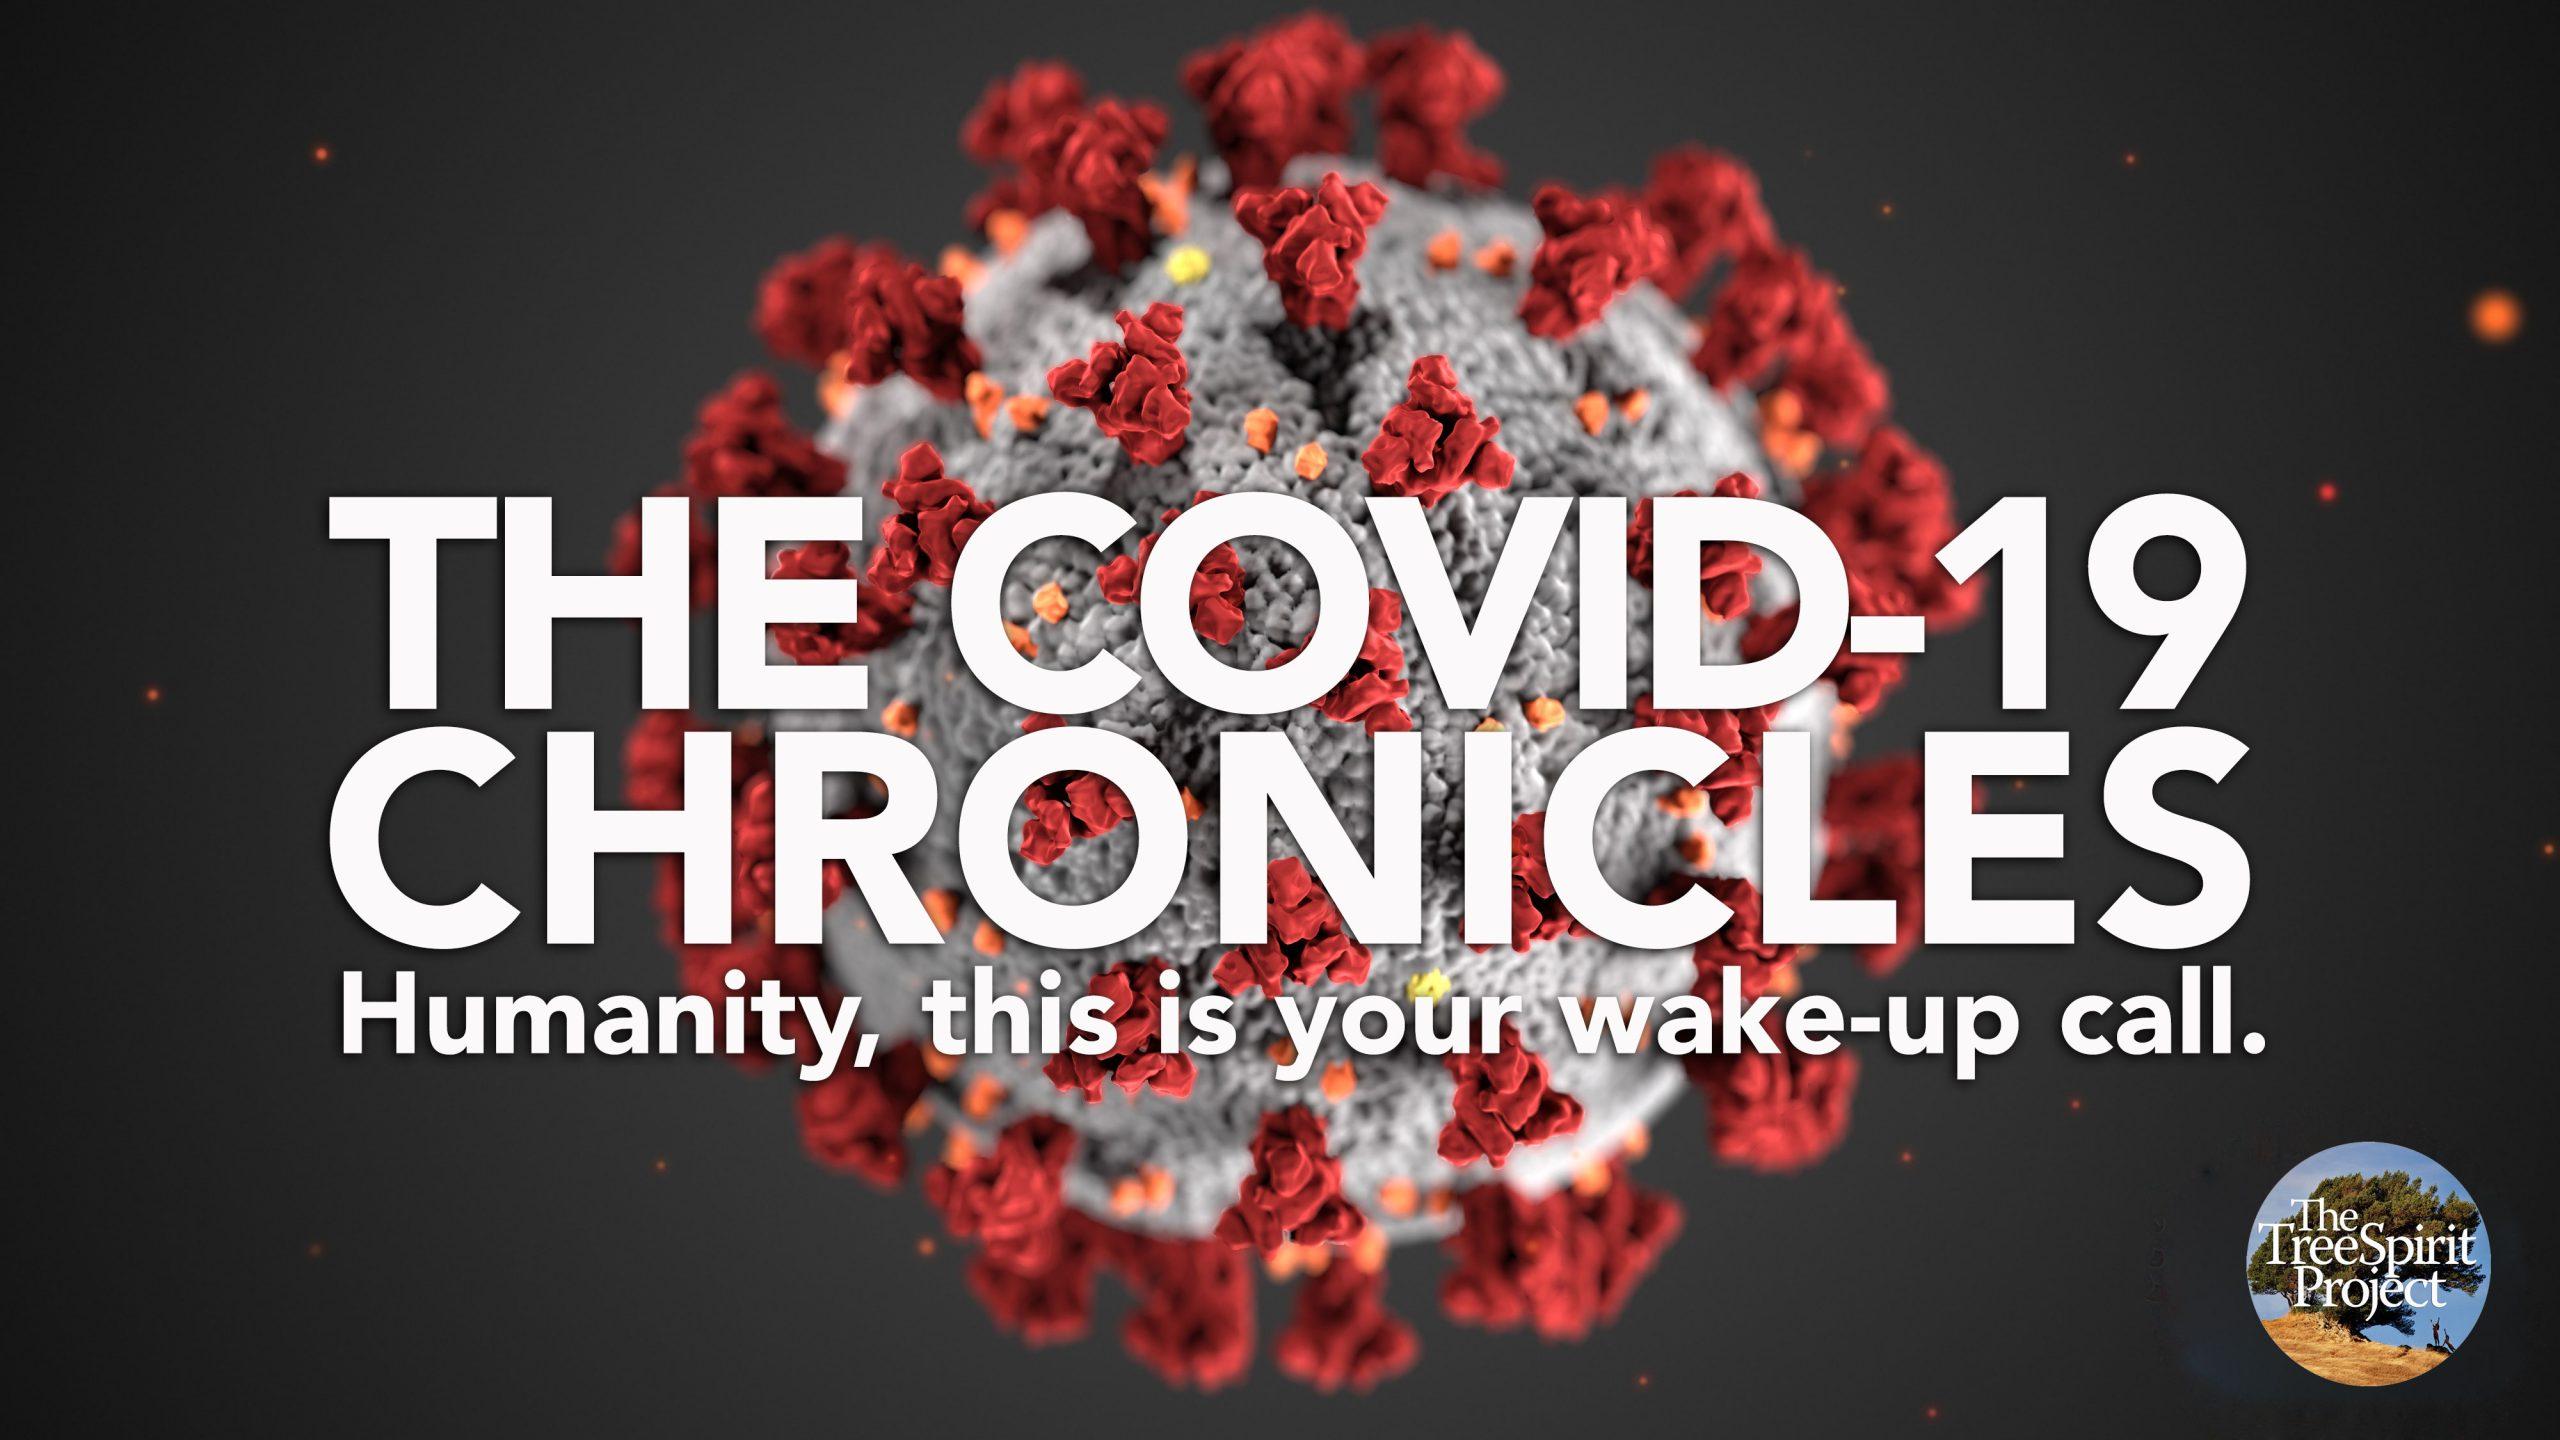 The-Covid-19-Chronicles-by-Jack-Gescheidt-TreeSpirit-Project.jpg